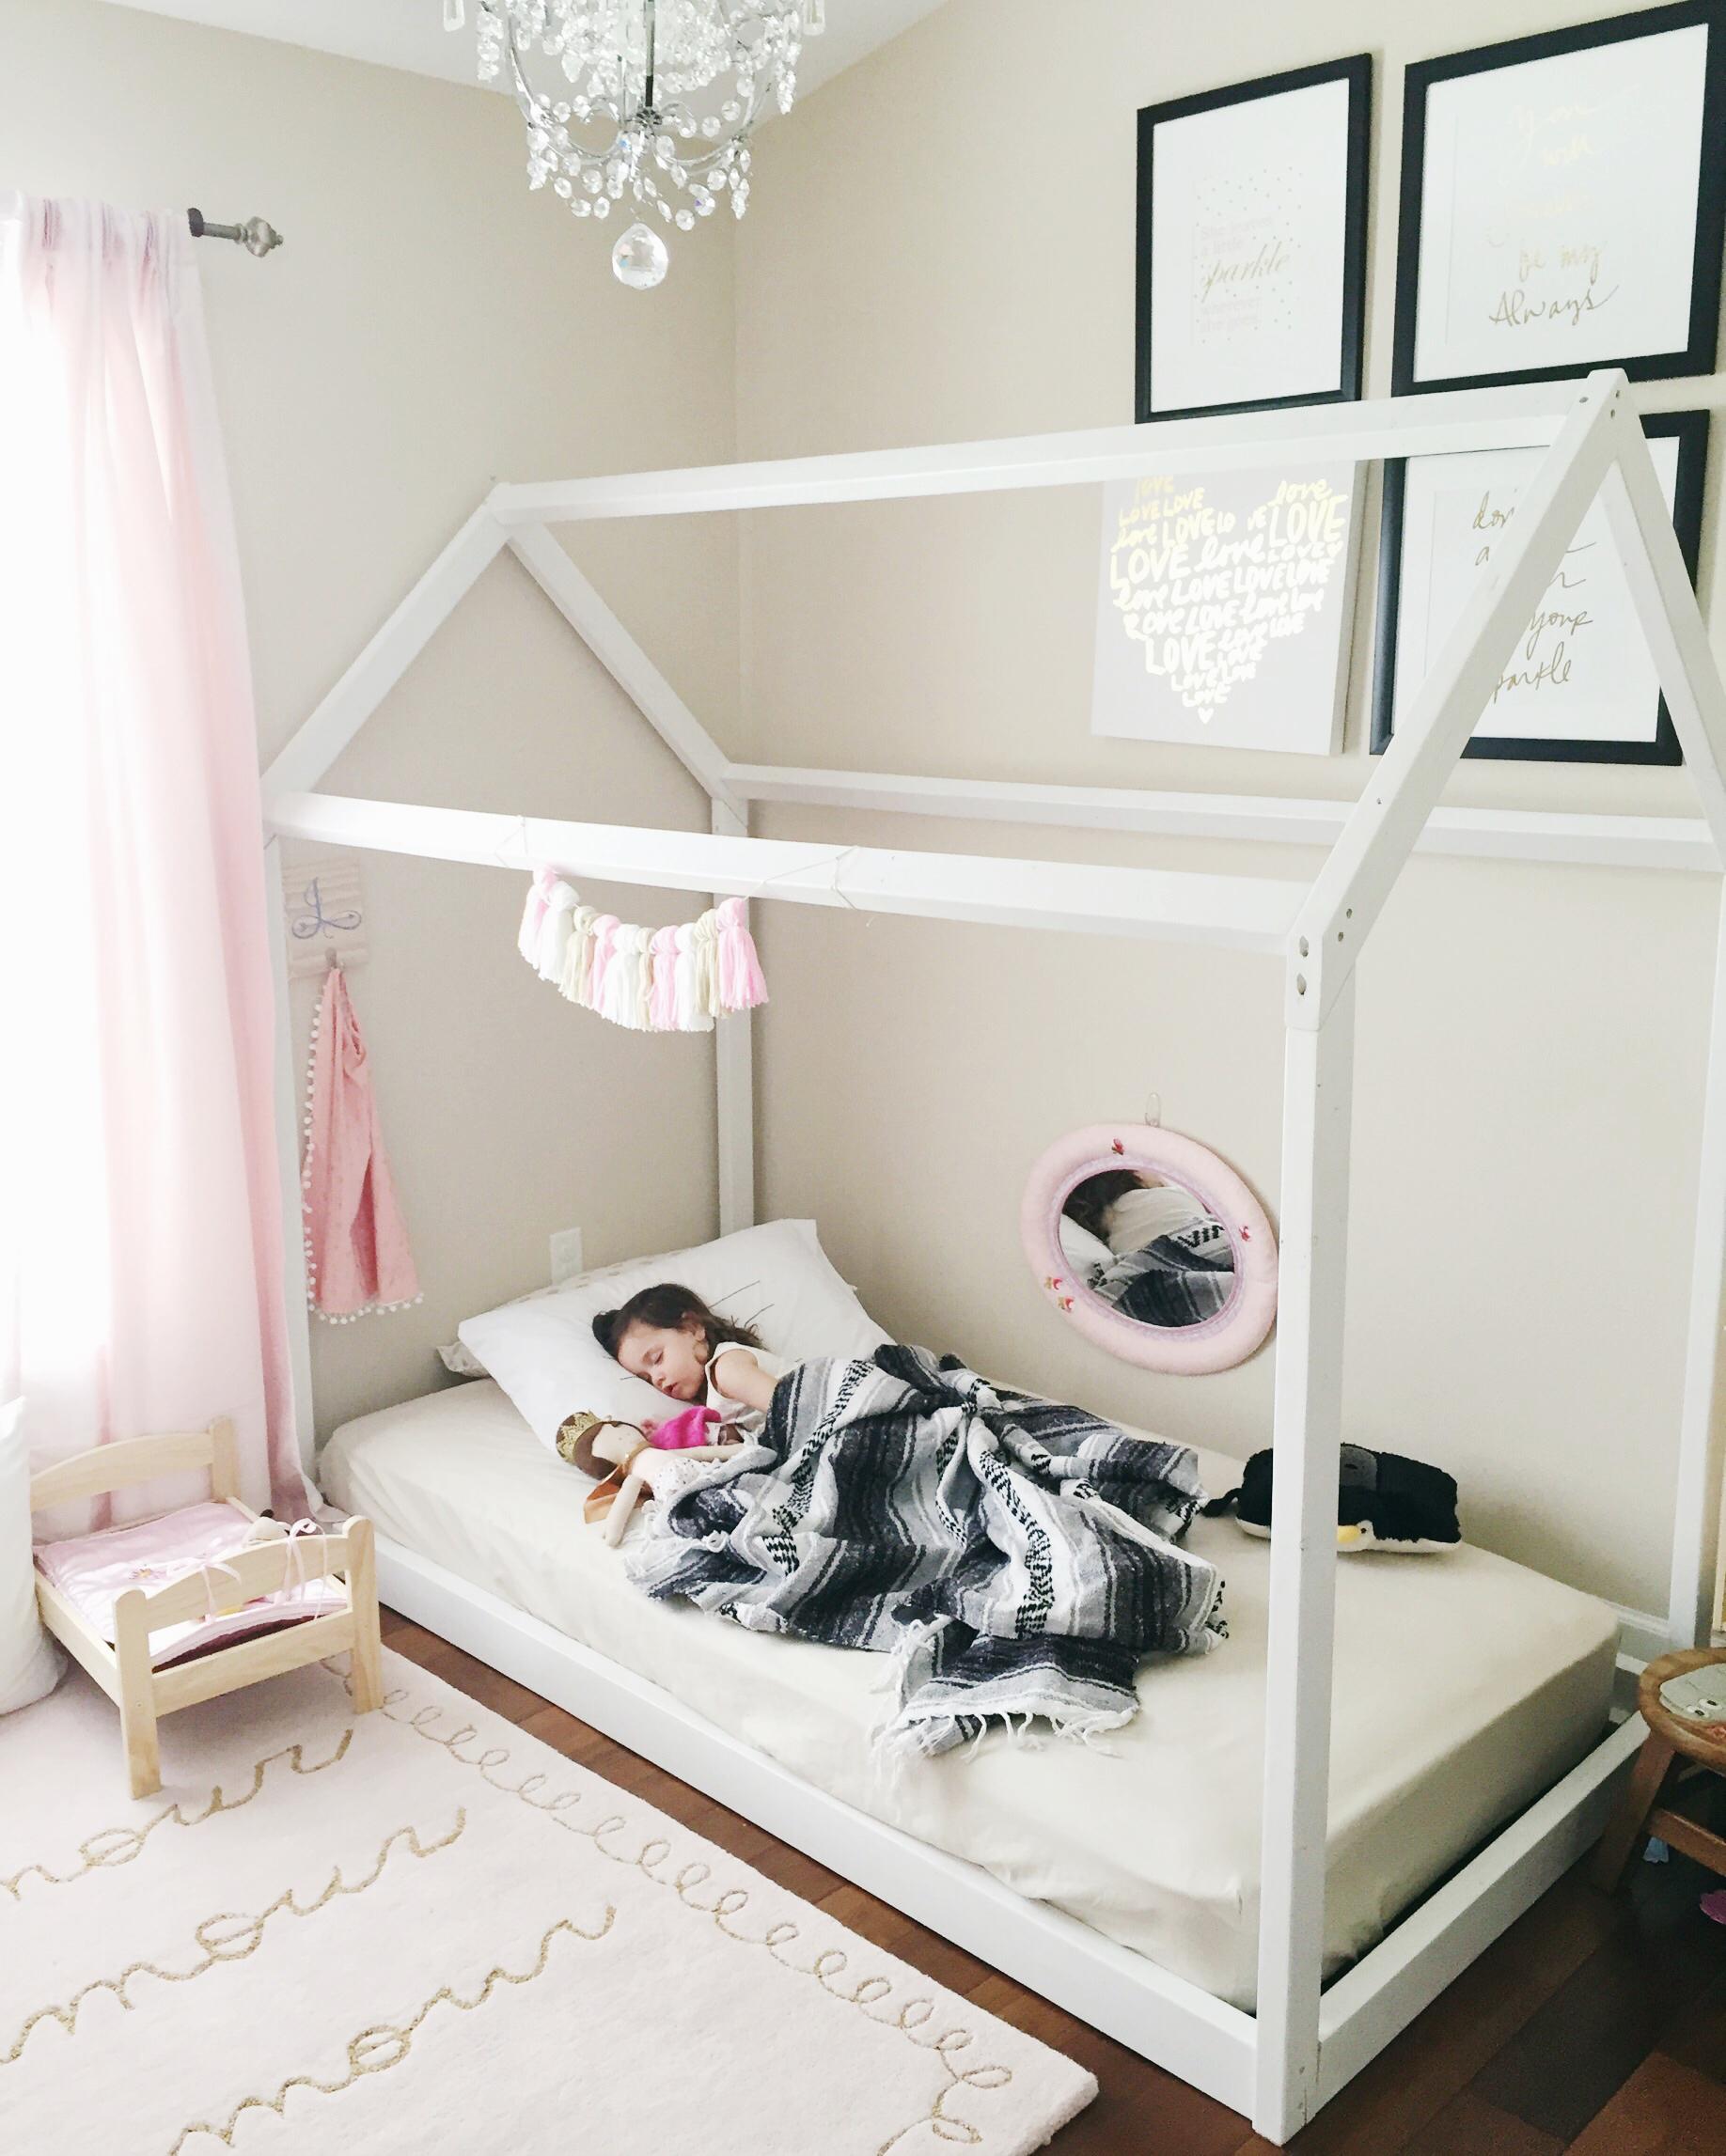 Diy Toddler Bed Part - 44: Montessori Floor Toddler Bed, Floor Bed, Toddler Bed, Toddler Floor Bed,  Montessori